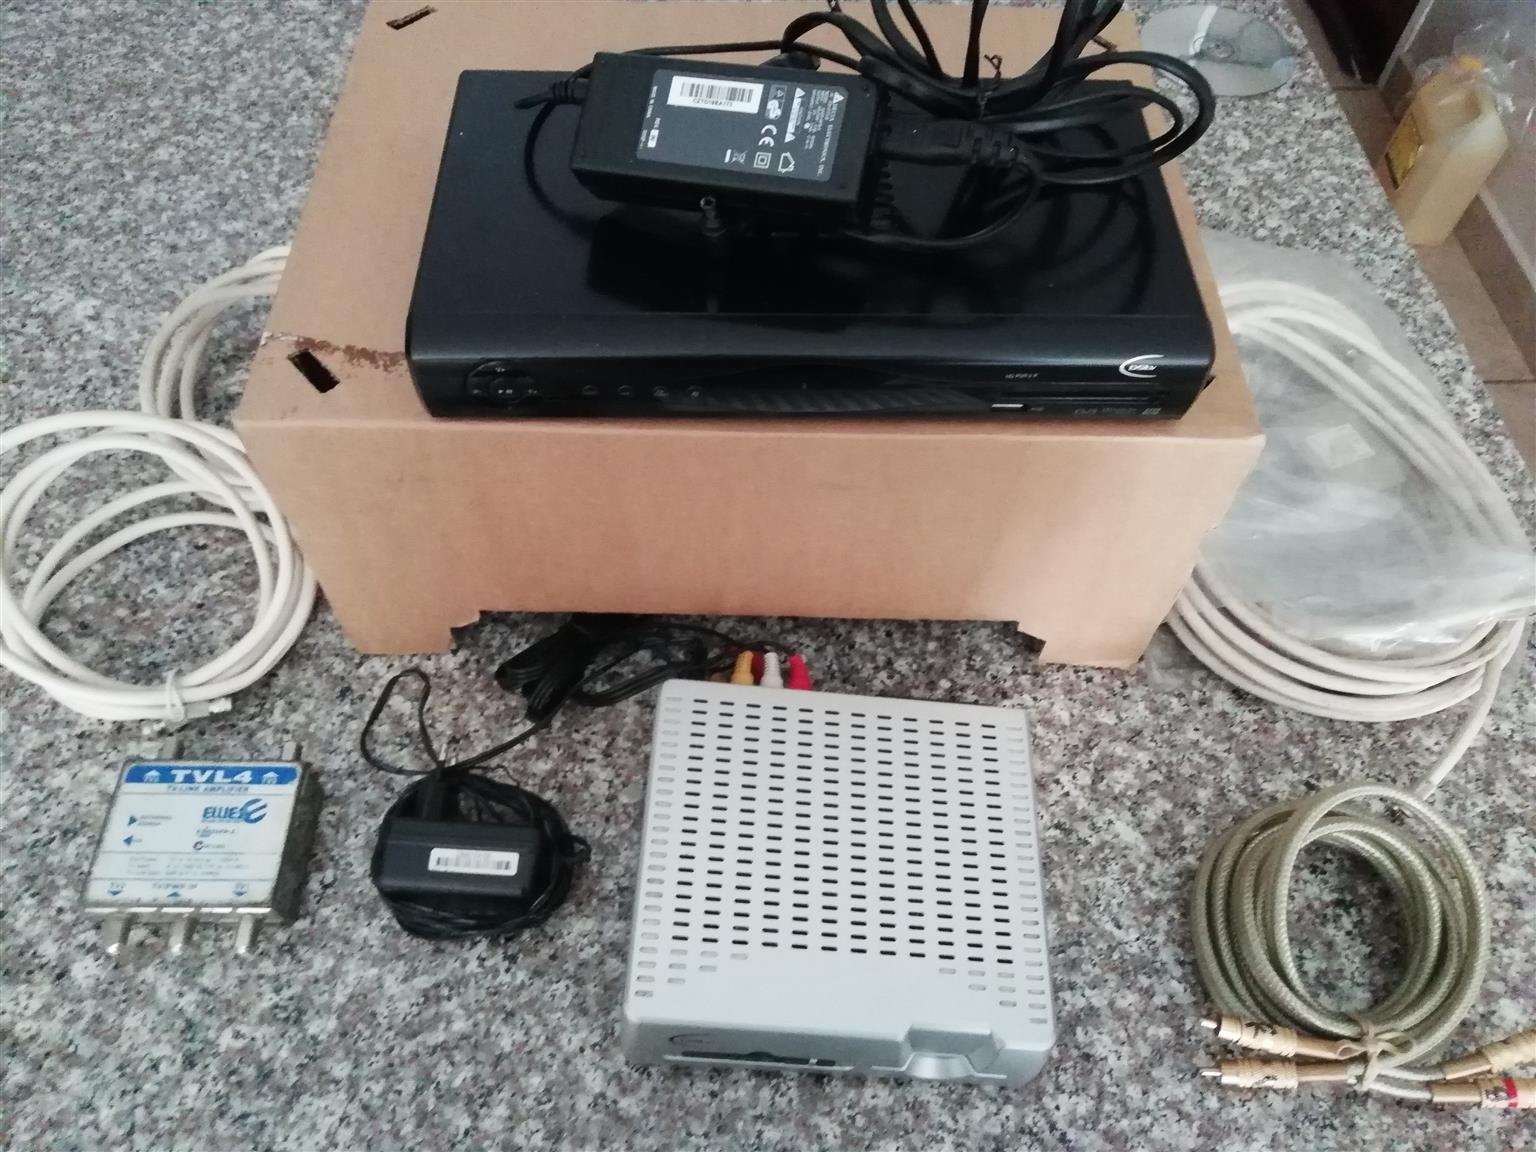 PVR 2 + extra decoder + TV-LINK box + wiring